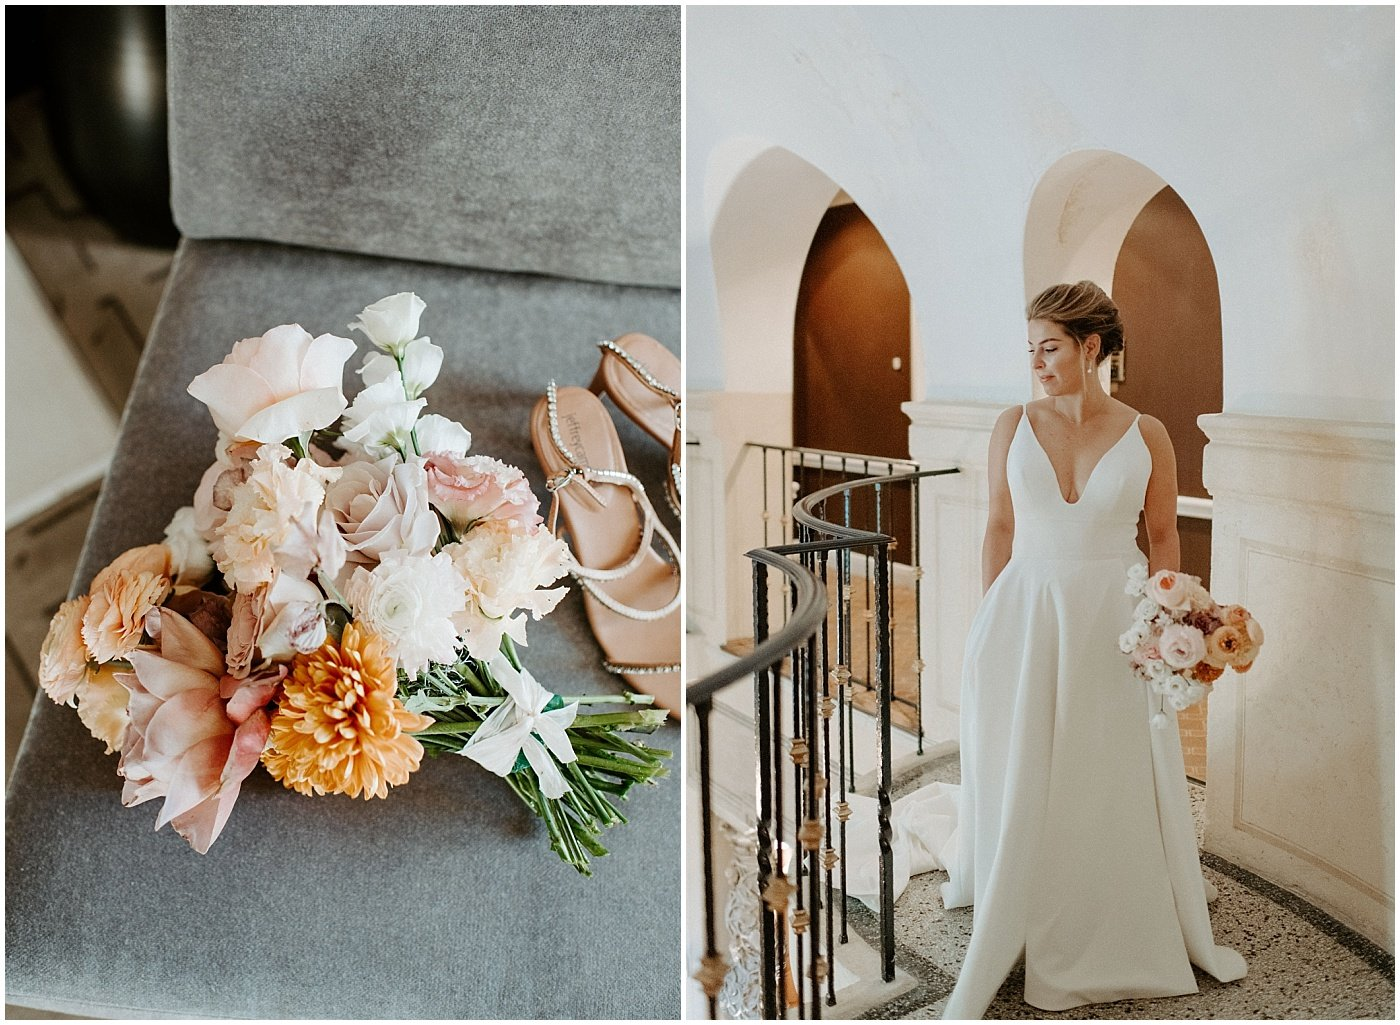 bride holding a lush bouquet of mauve, blush, and orange blooms